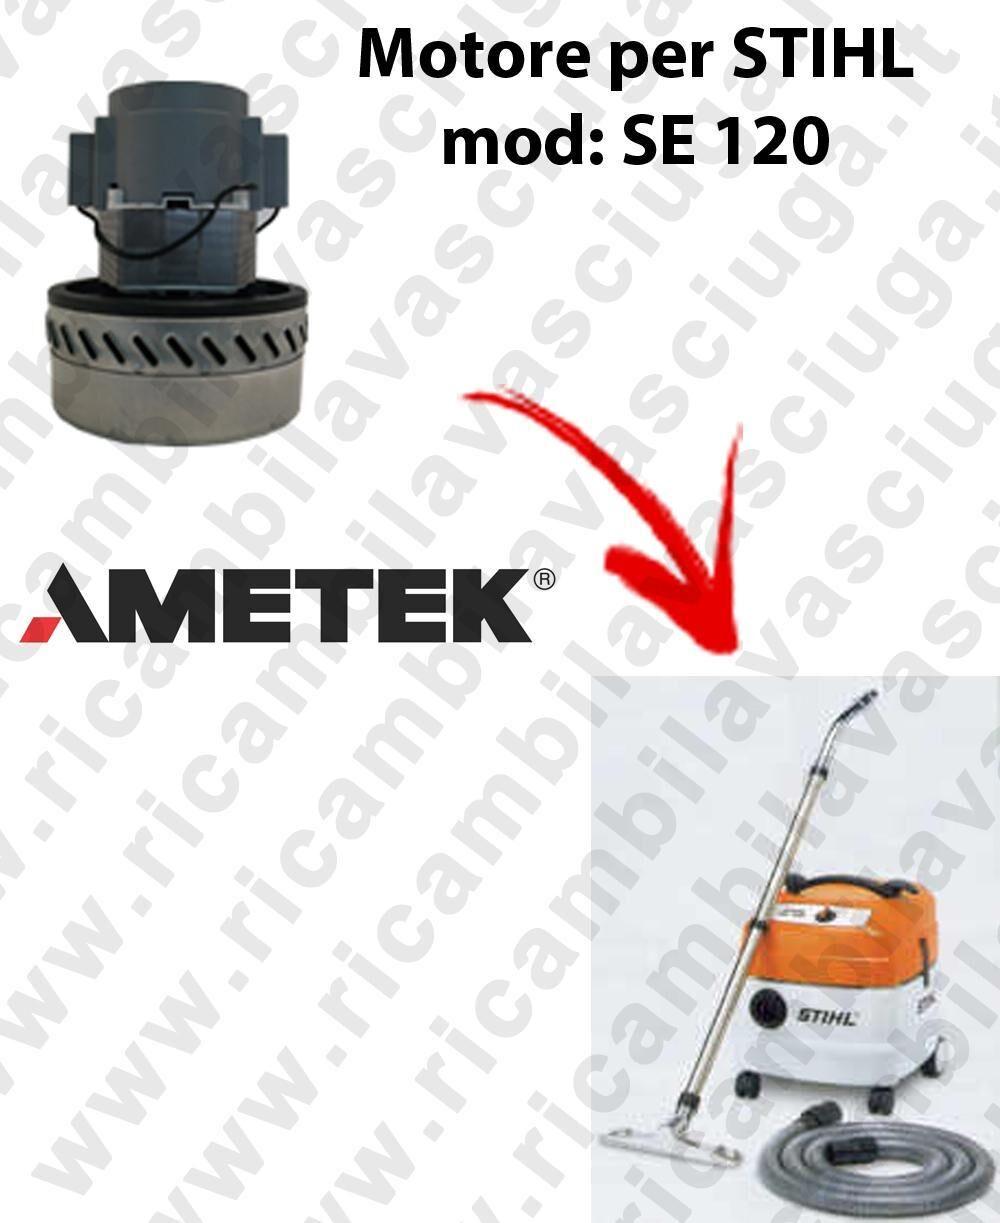 Stihl Motore aspirazione AMETEK per aspirapolvere SE 120